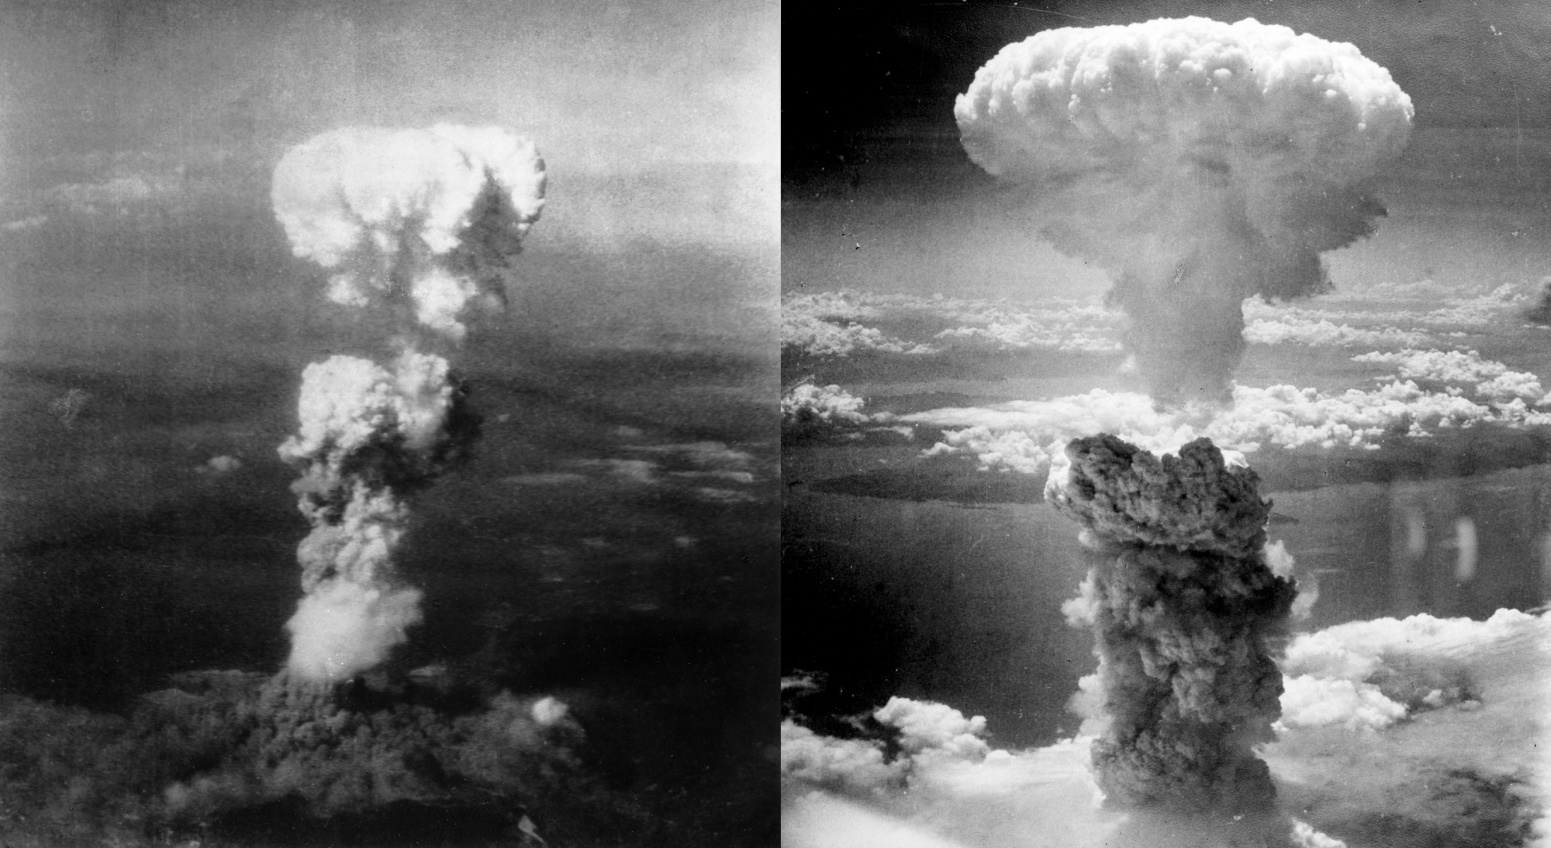 C:\Documents and Settings\User\Рабочий стол\Atomic_bombing_of_Japan.jpg